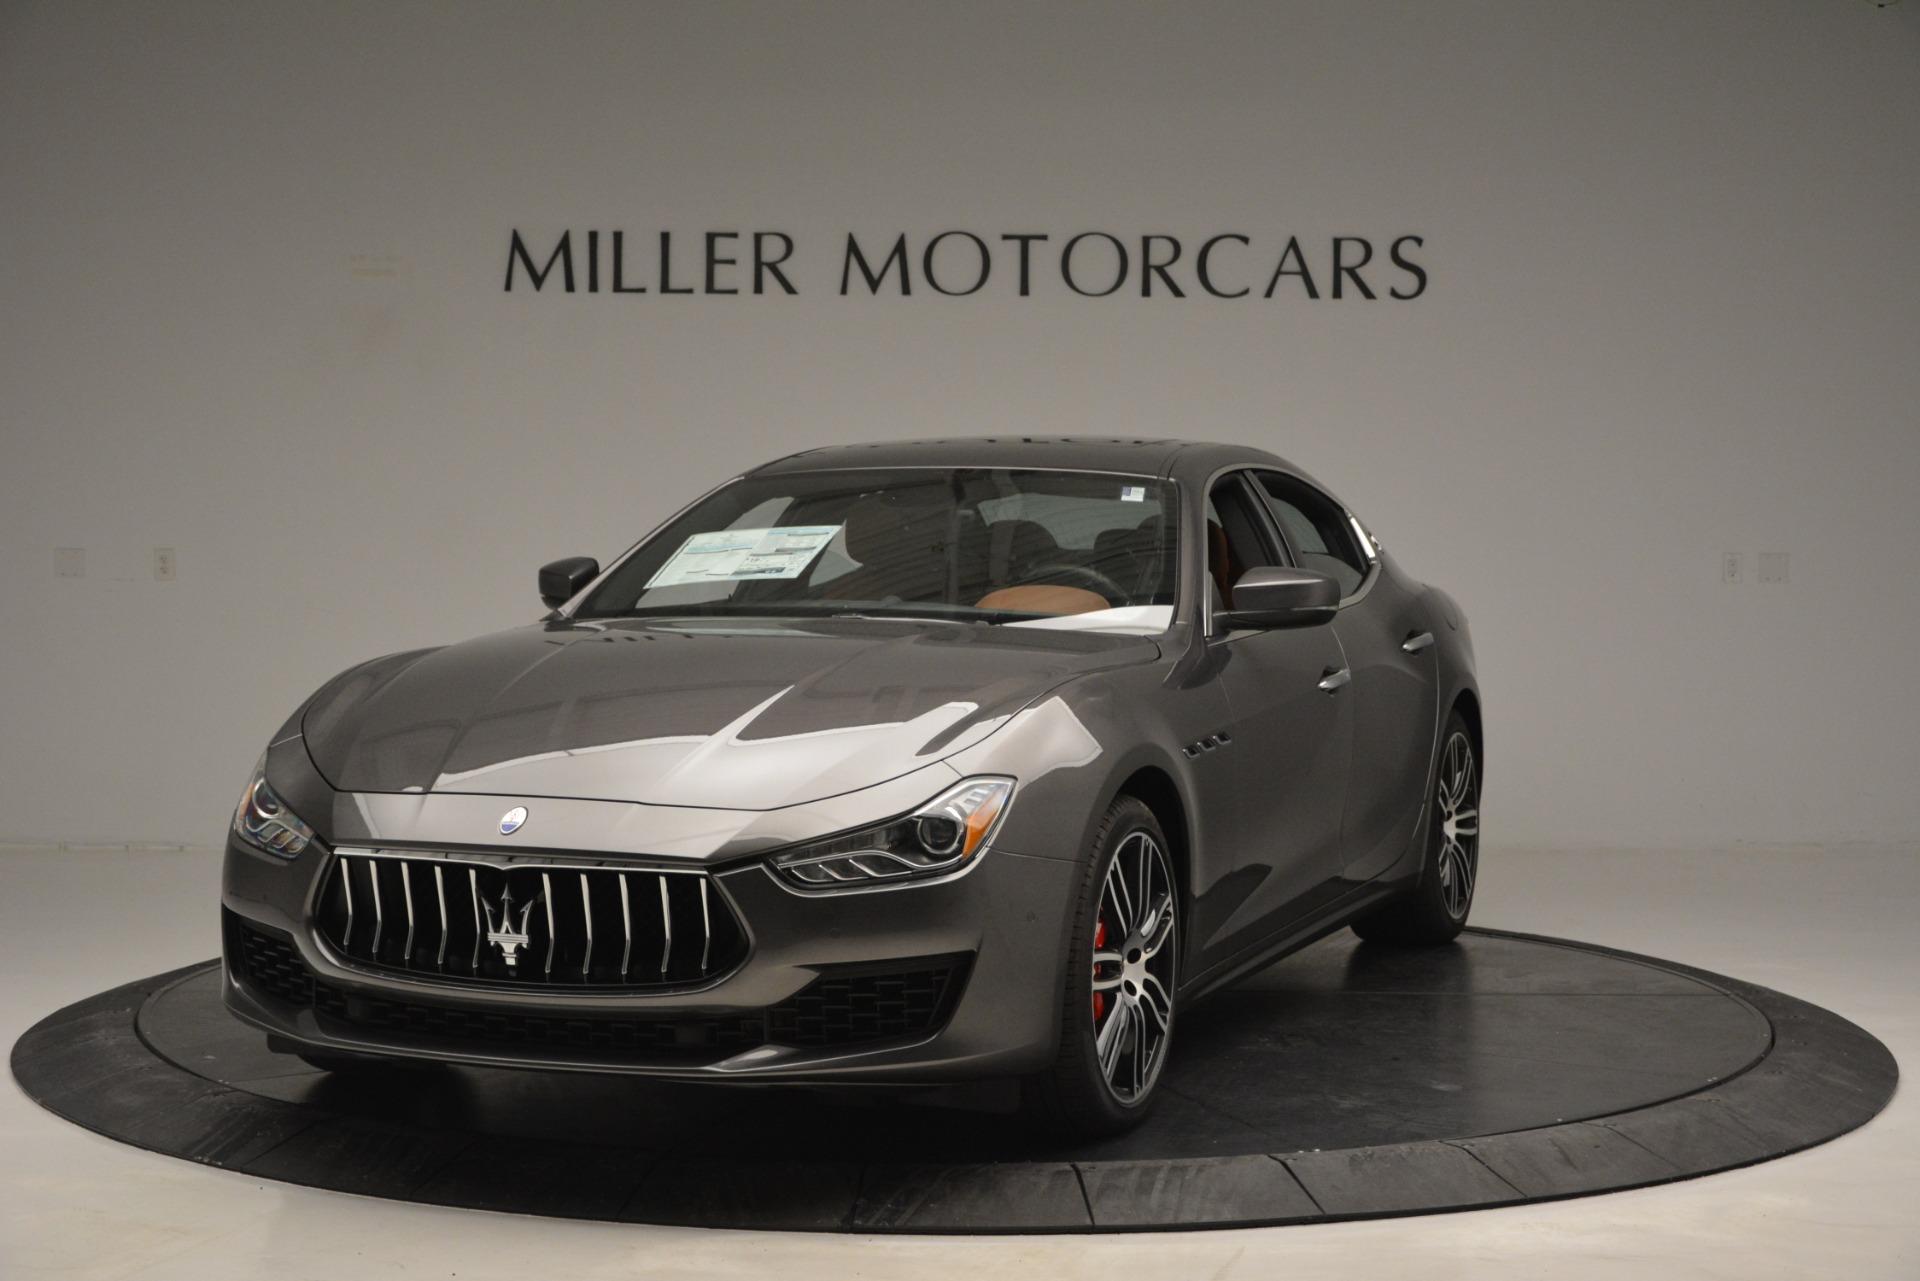 New 2019 Maserati Ghibli S Q4 For Sale In Greenwich, CT. Alfa Romeo of Greenwich, M2202 2623_main